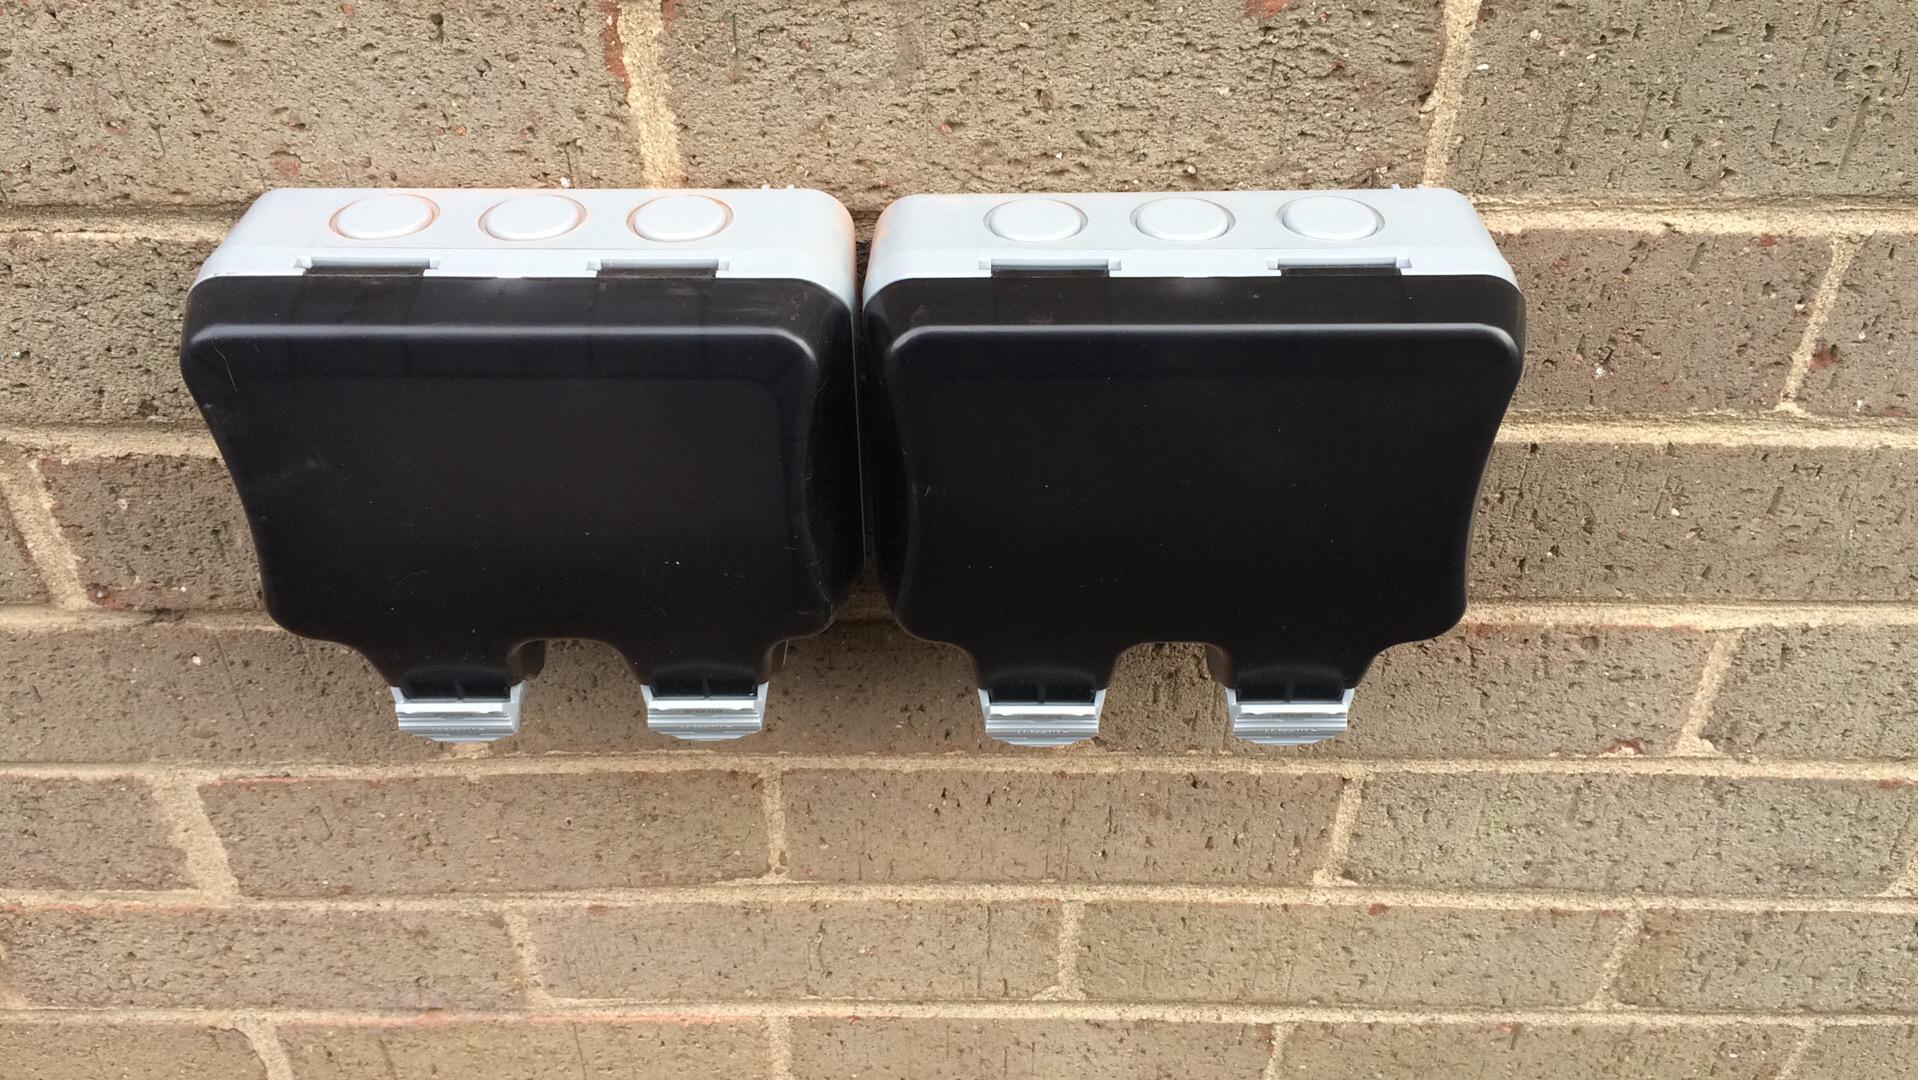 New IP66 waterproof sockets installed